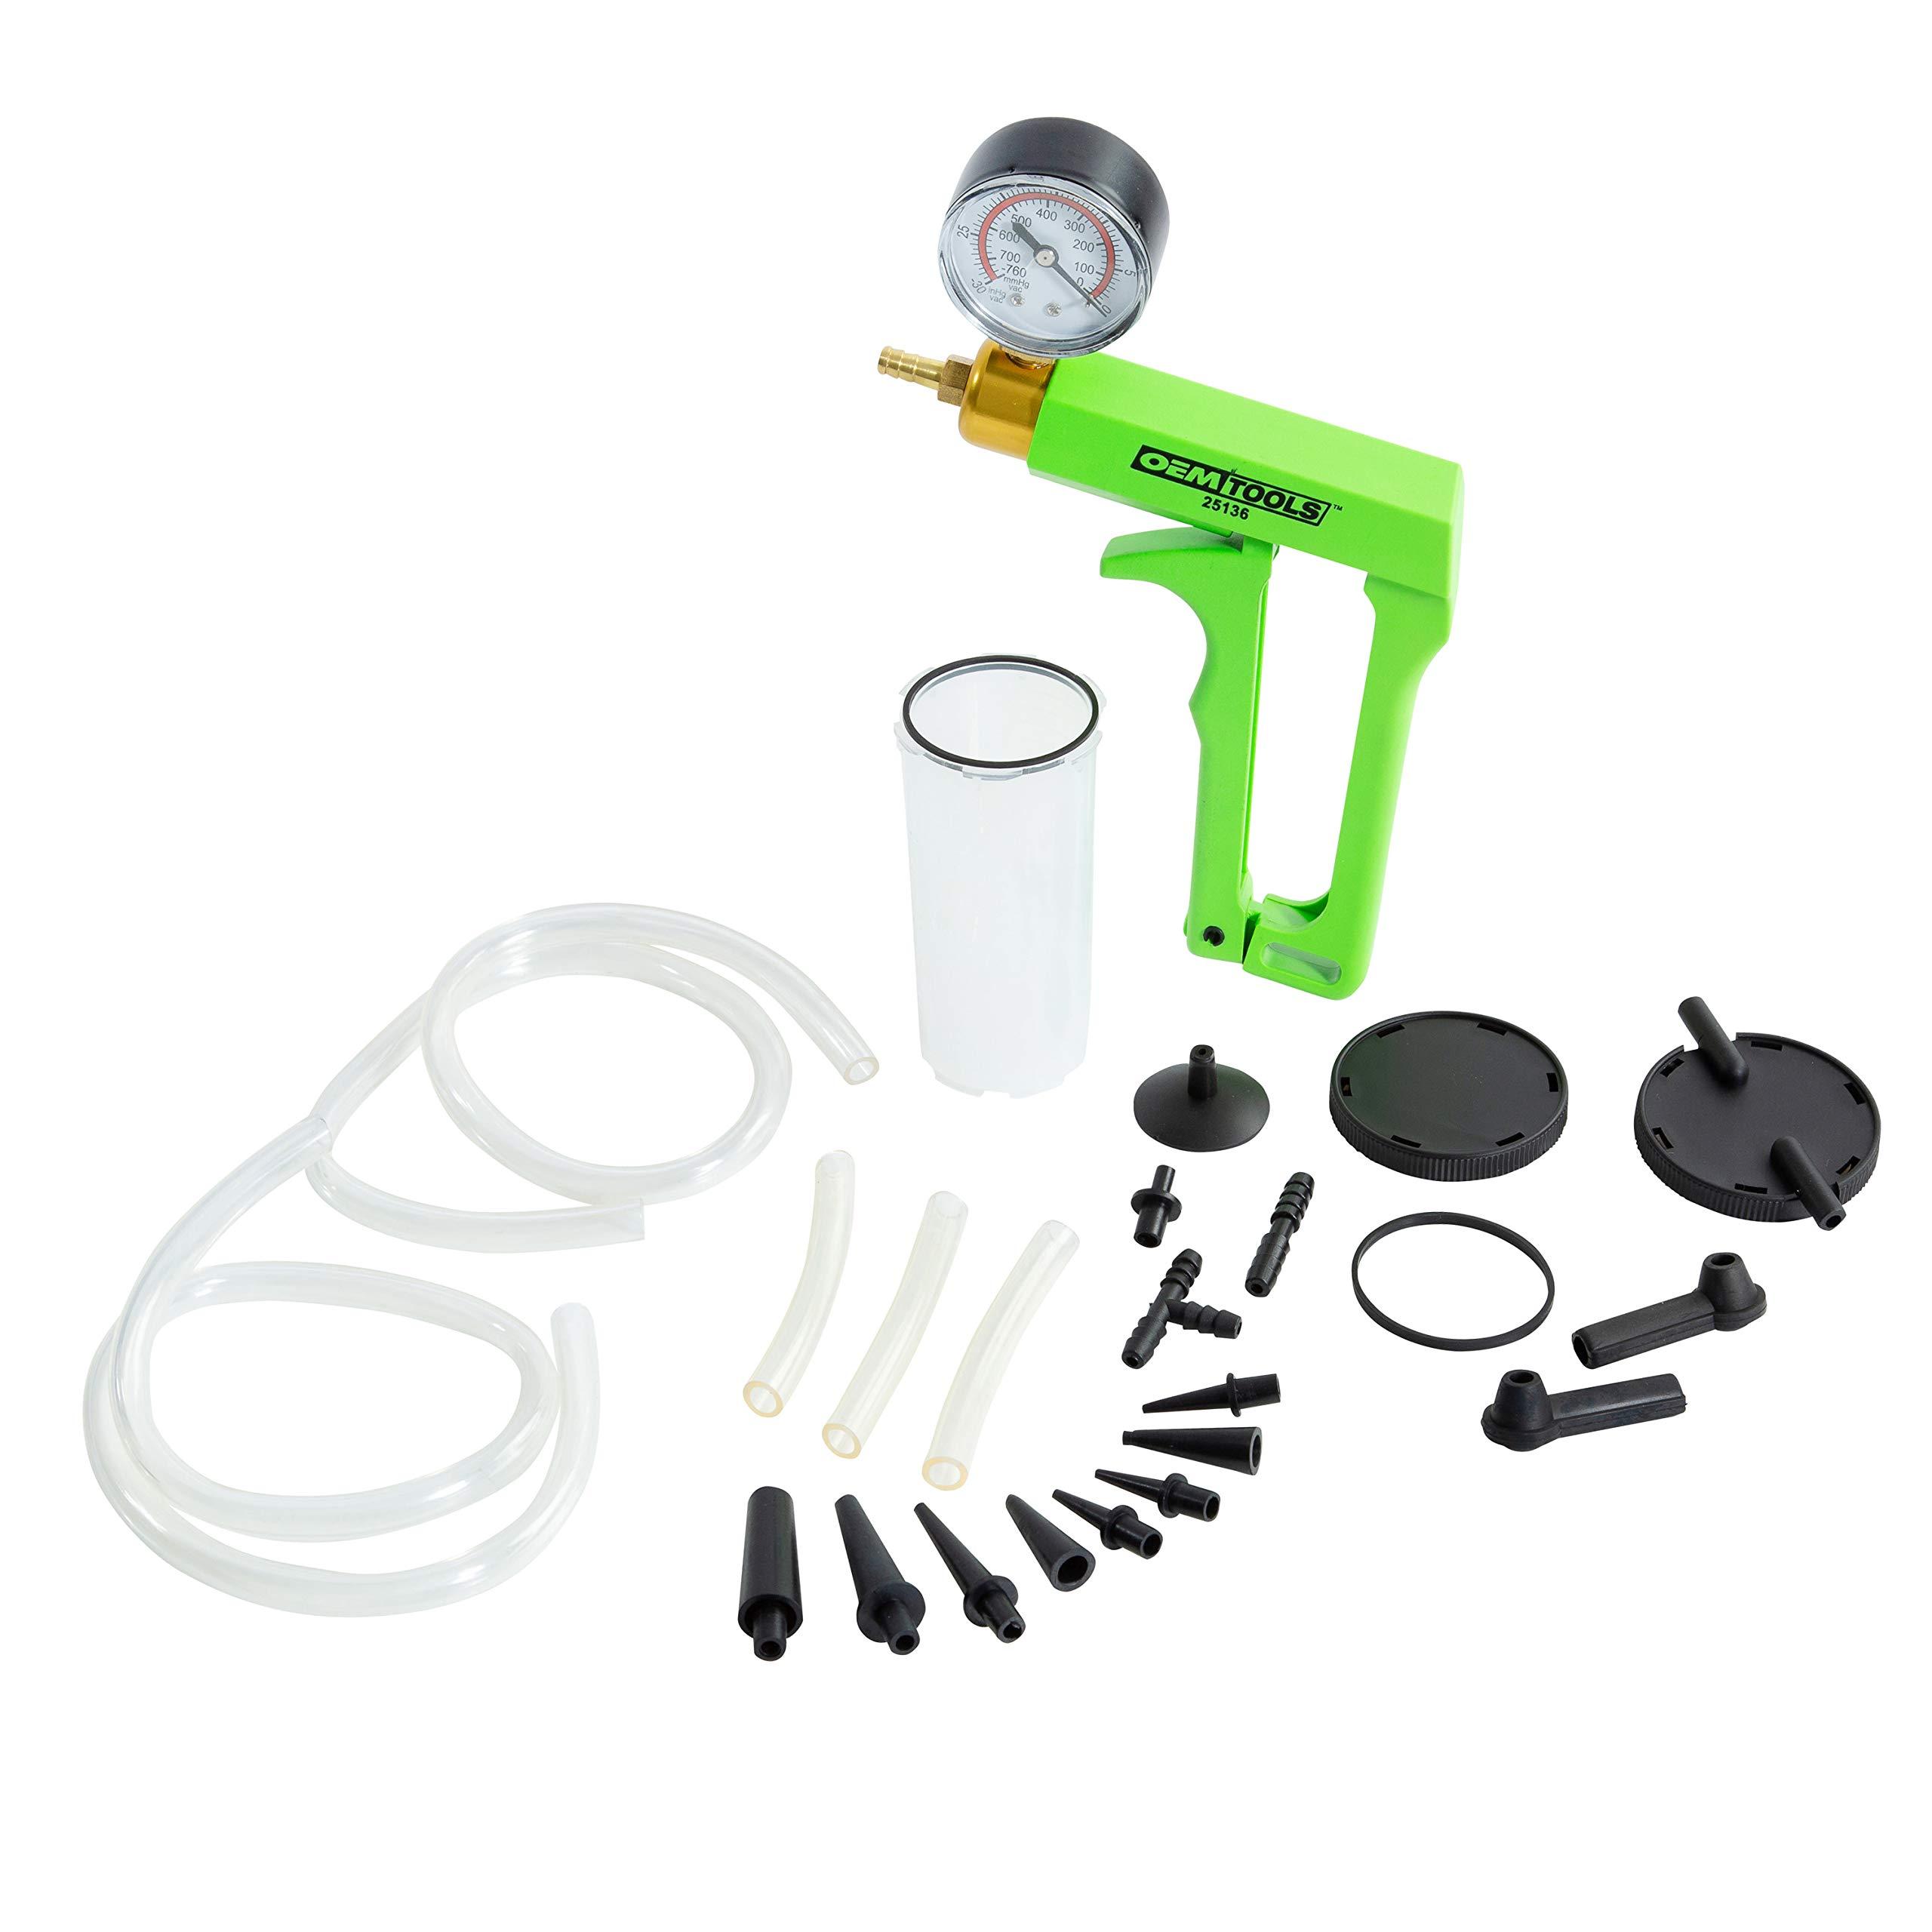 OEMTOOLS 25136 One Man Brake Bleeder & Vacuum Pump Test Kit, Useful Tool for Automotive Tune-Ups, Diagnosis, & Testing, One-Person Brake Bleeding